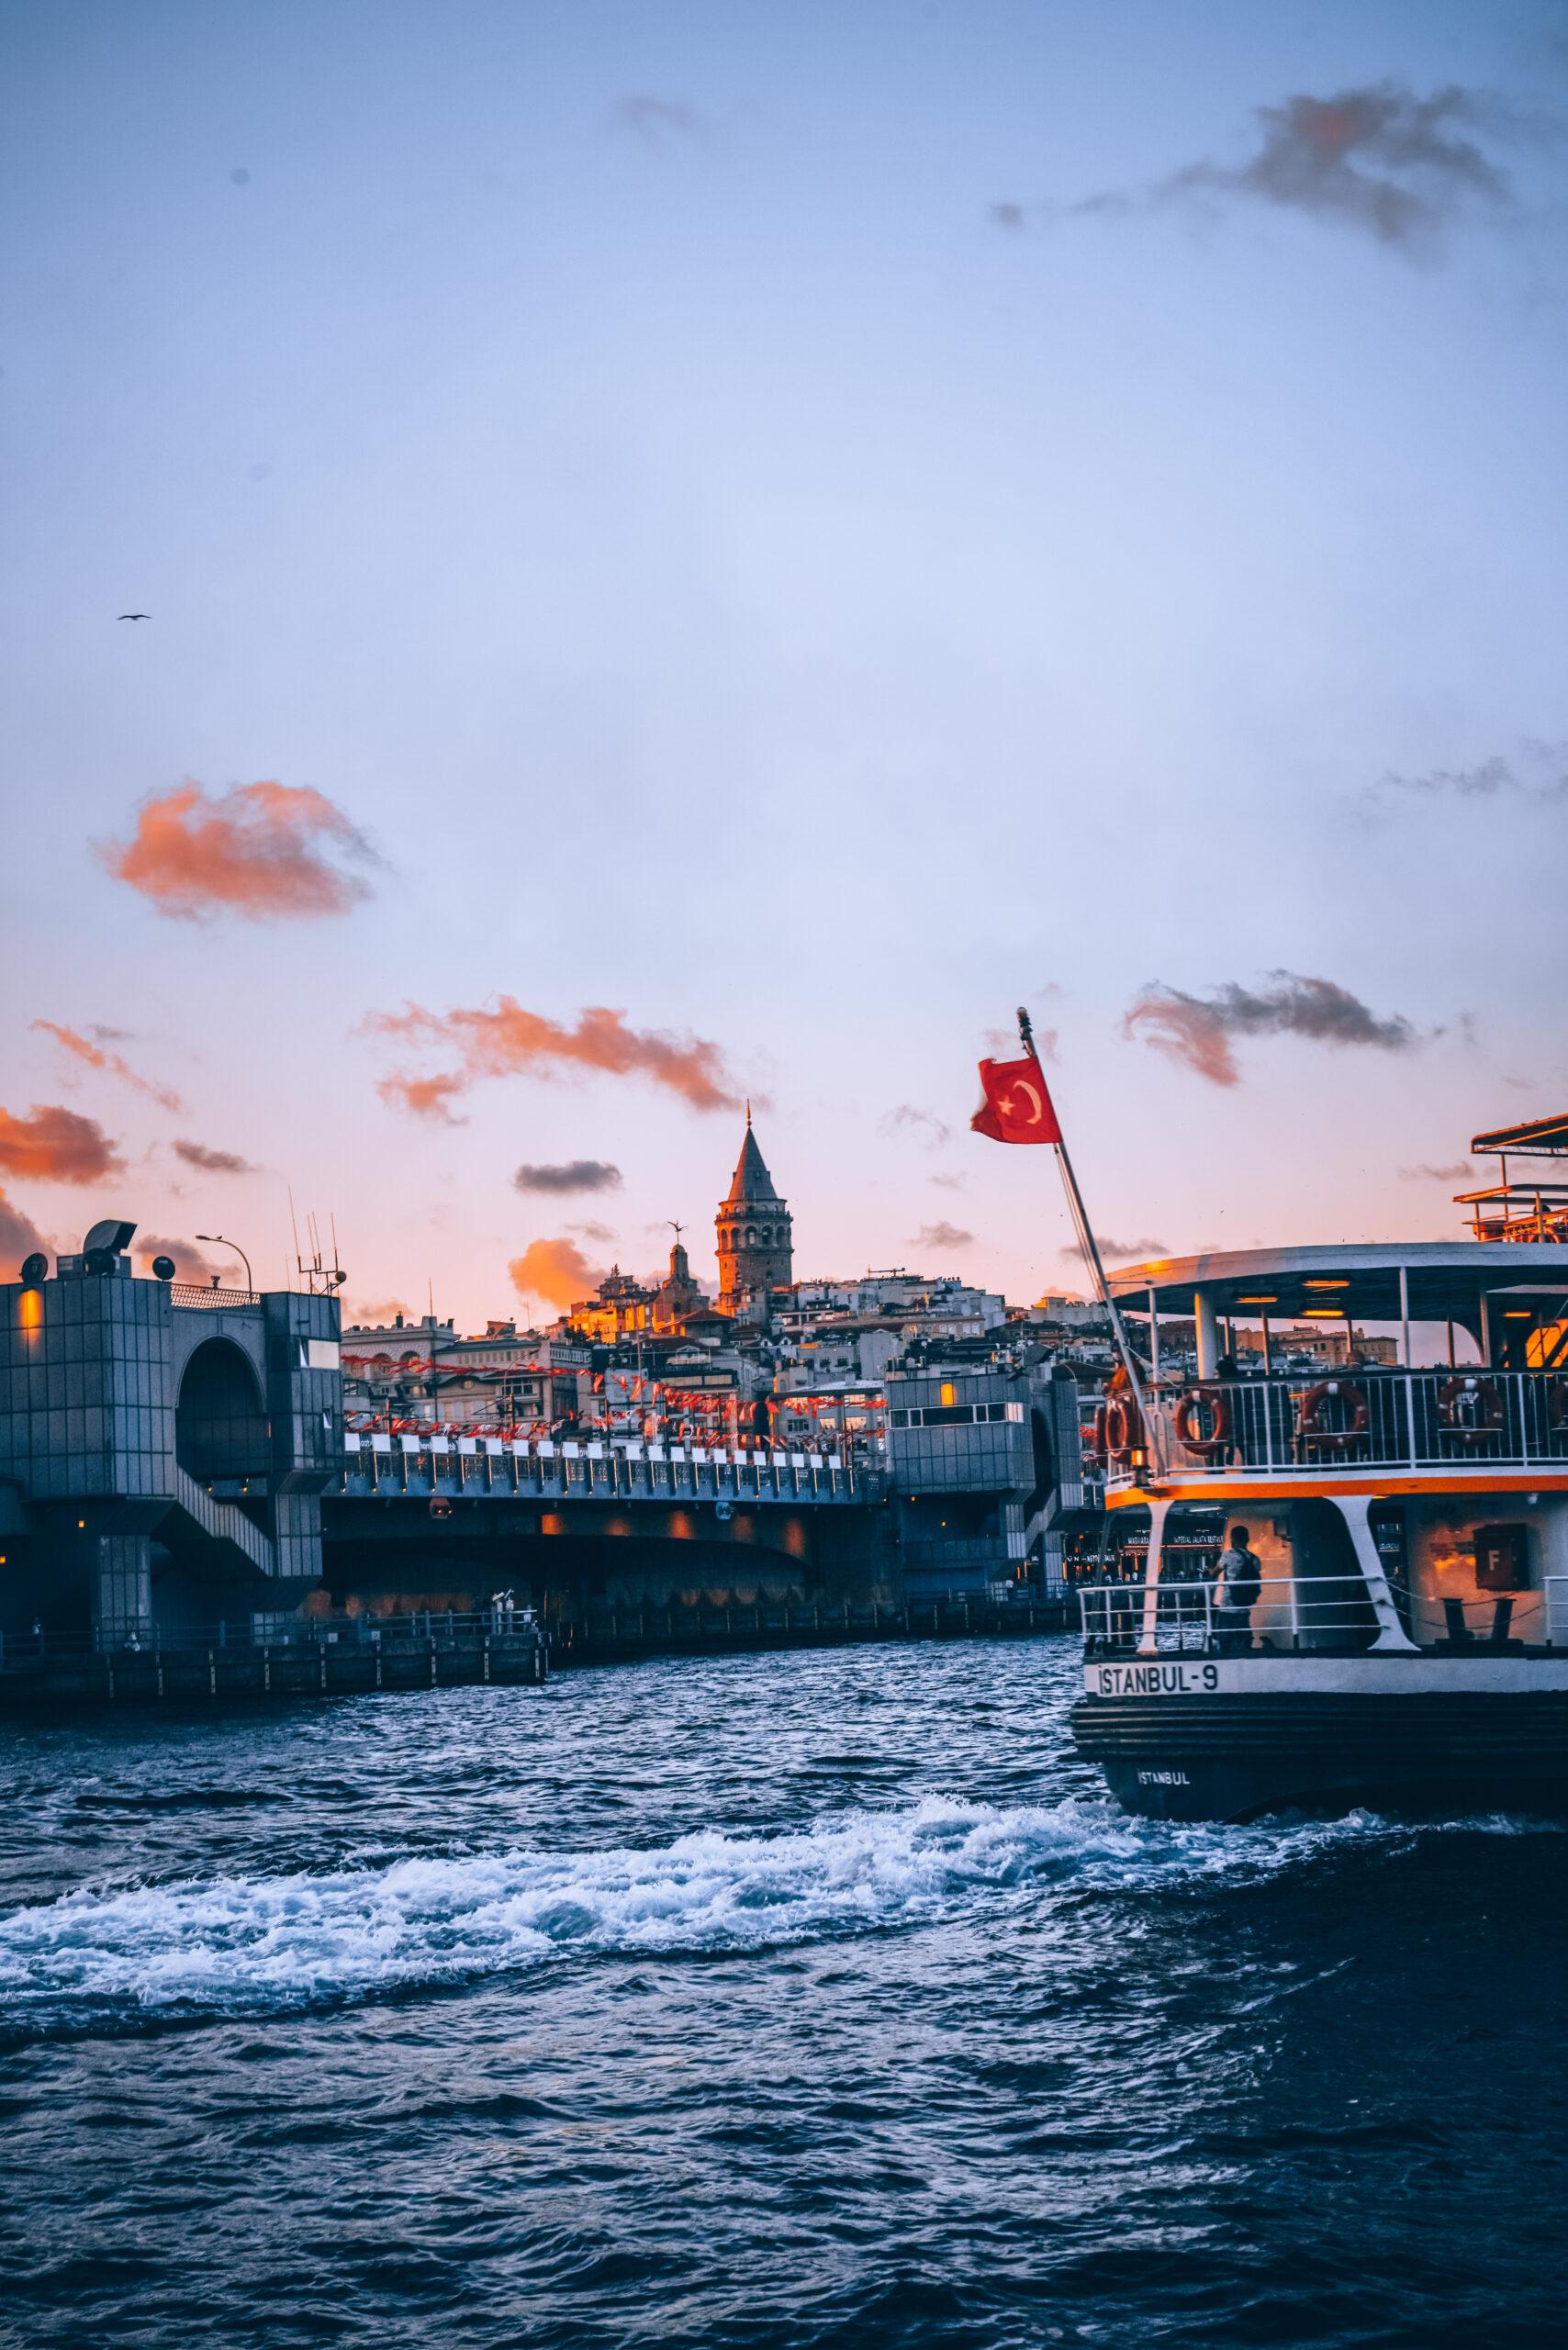 https://www.tourbulance.com.tr/wp-content/uploads/2021/03/Istanbul6-scaled.jpg